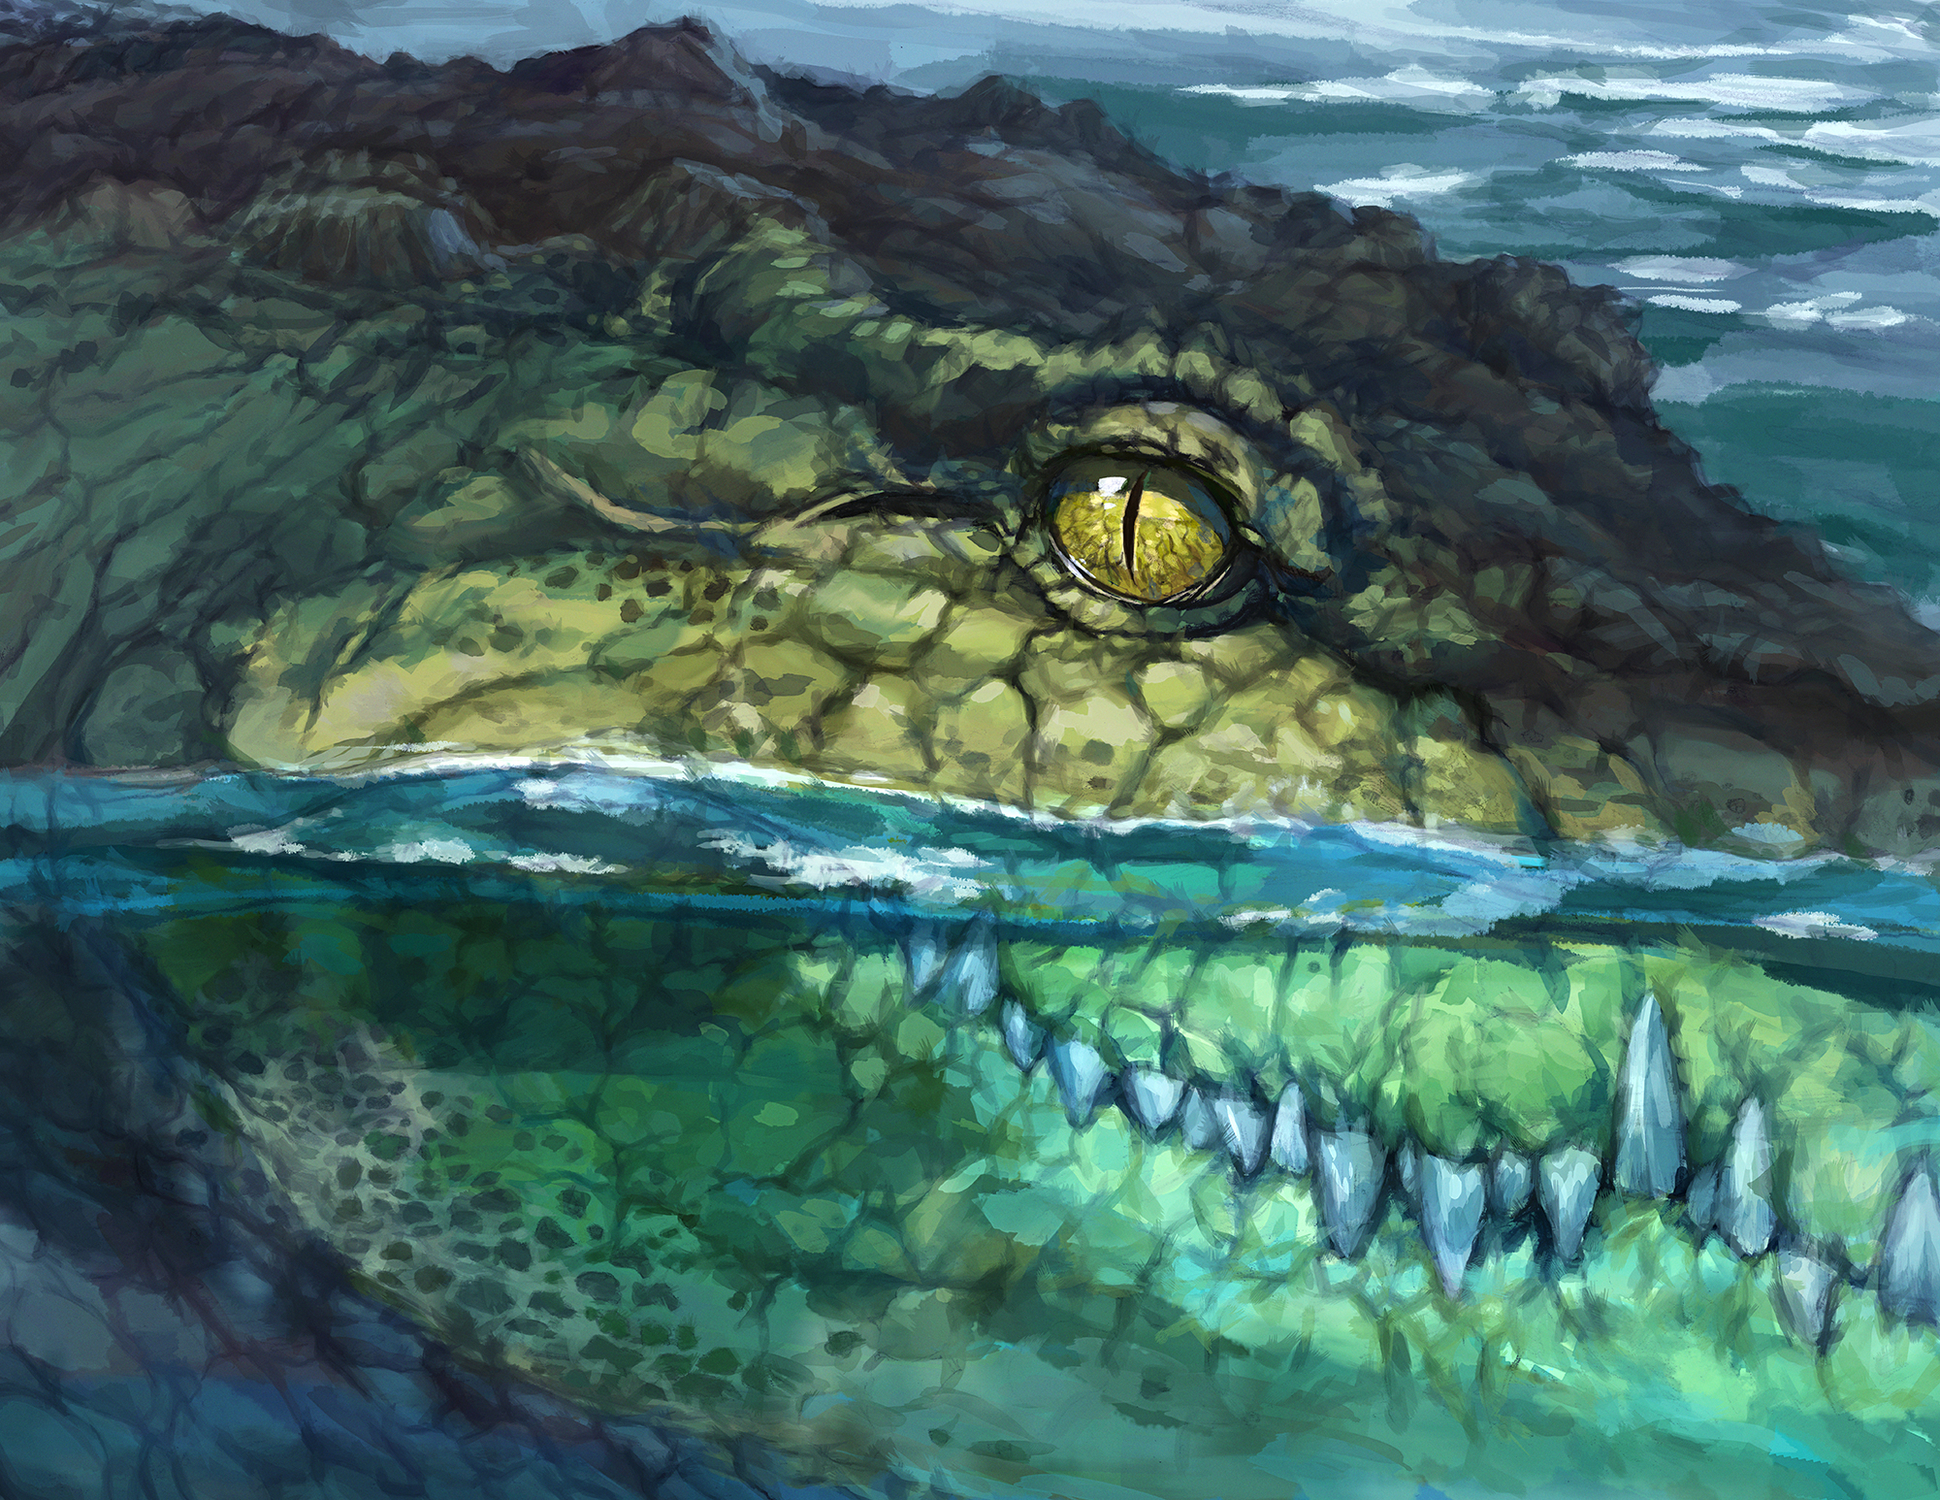 Don't Go Near the Crocodile Ponds Artwork by Brian C. Hailes